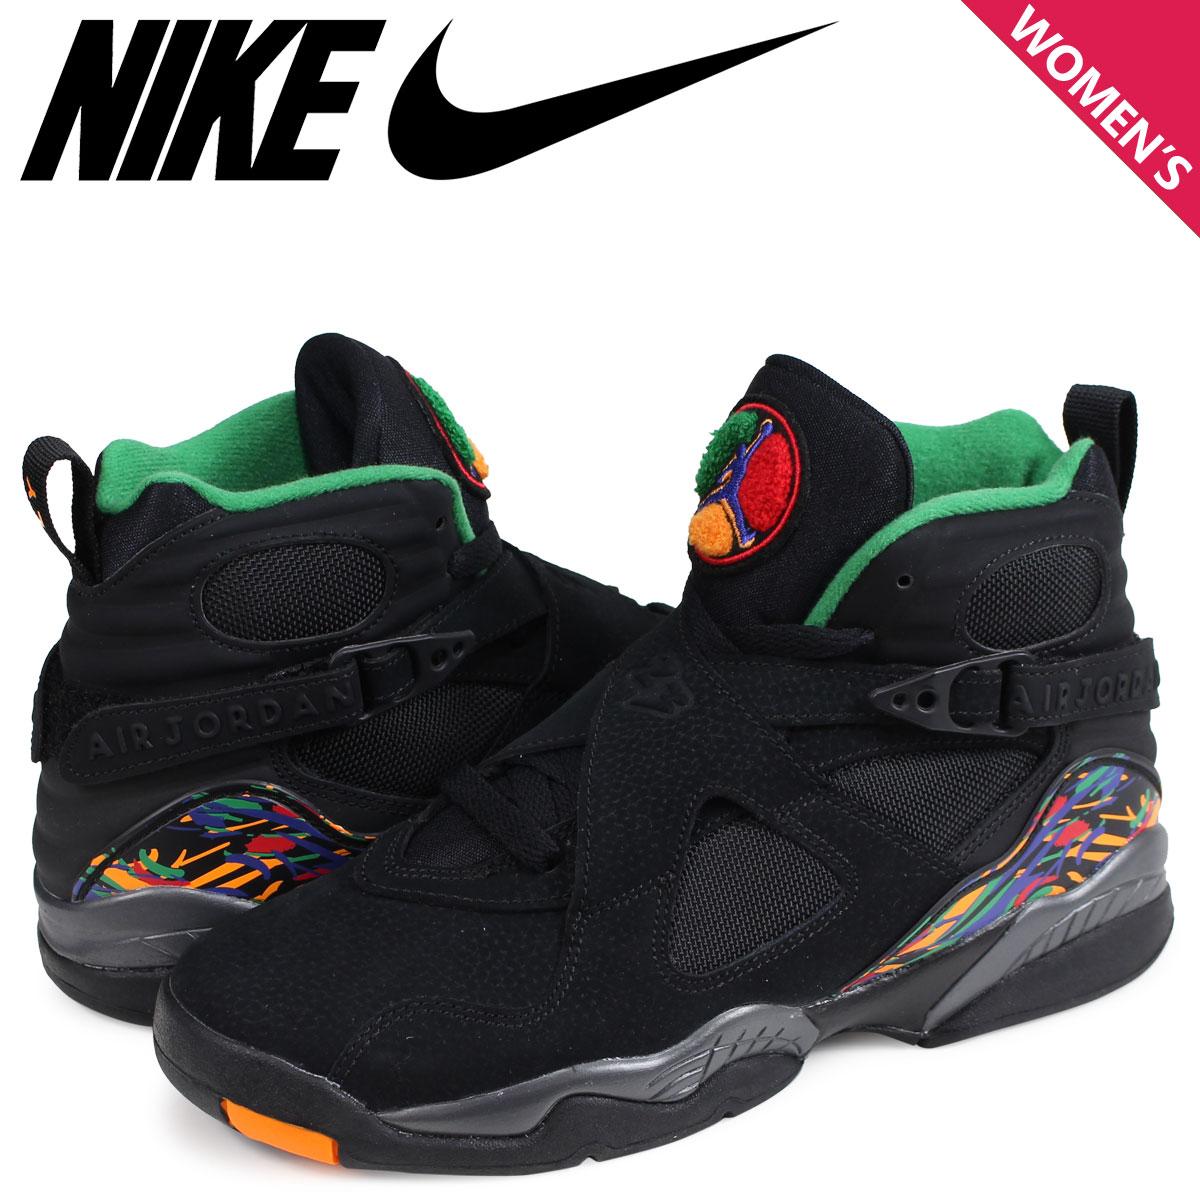 845cd6f6ef6 NIKE AIR JORDAN 8 RETRO GS Nike Air Jordan 8 nostalgic sneakers Lady's  305,368-004 ...